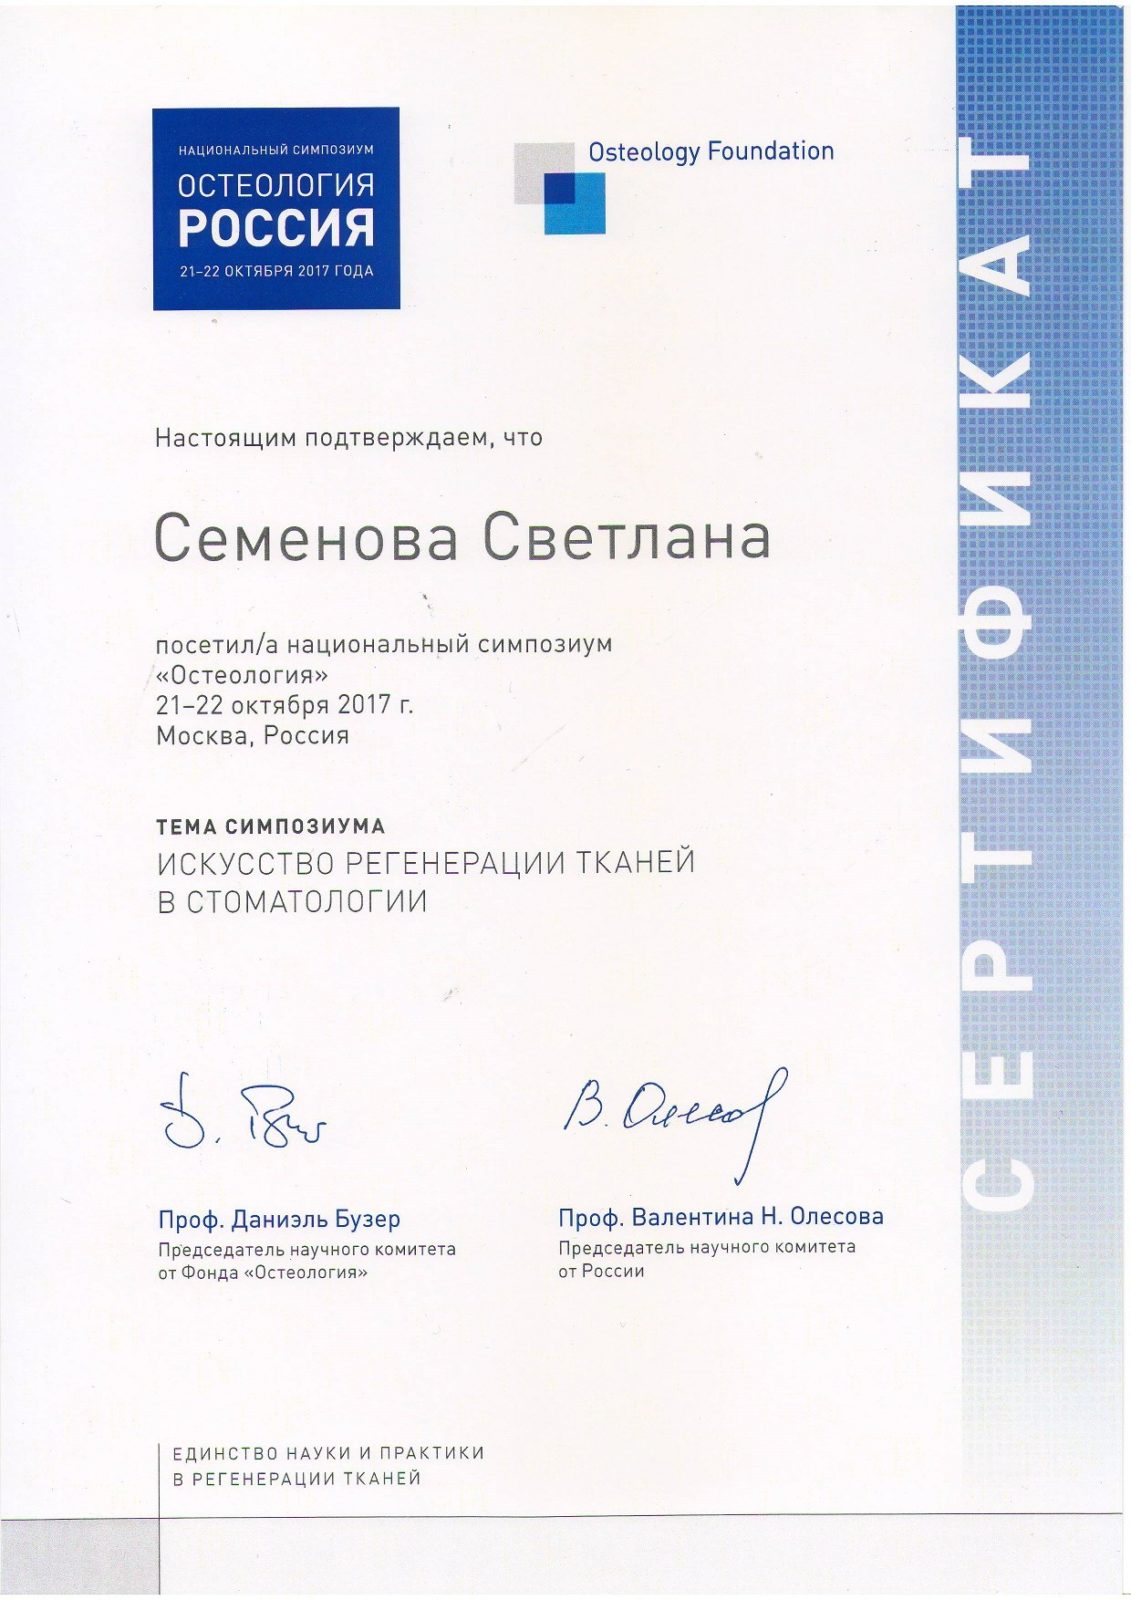 http://oris-vidnoe.ru/wp-content/uploads/2021/06/semenova2.jpg